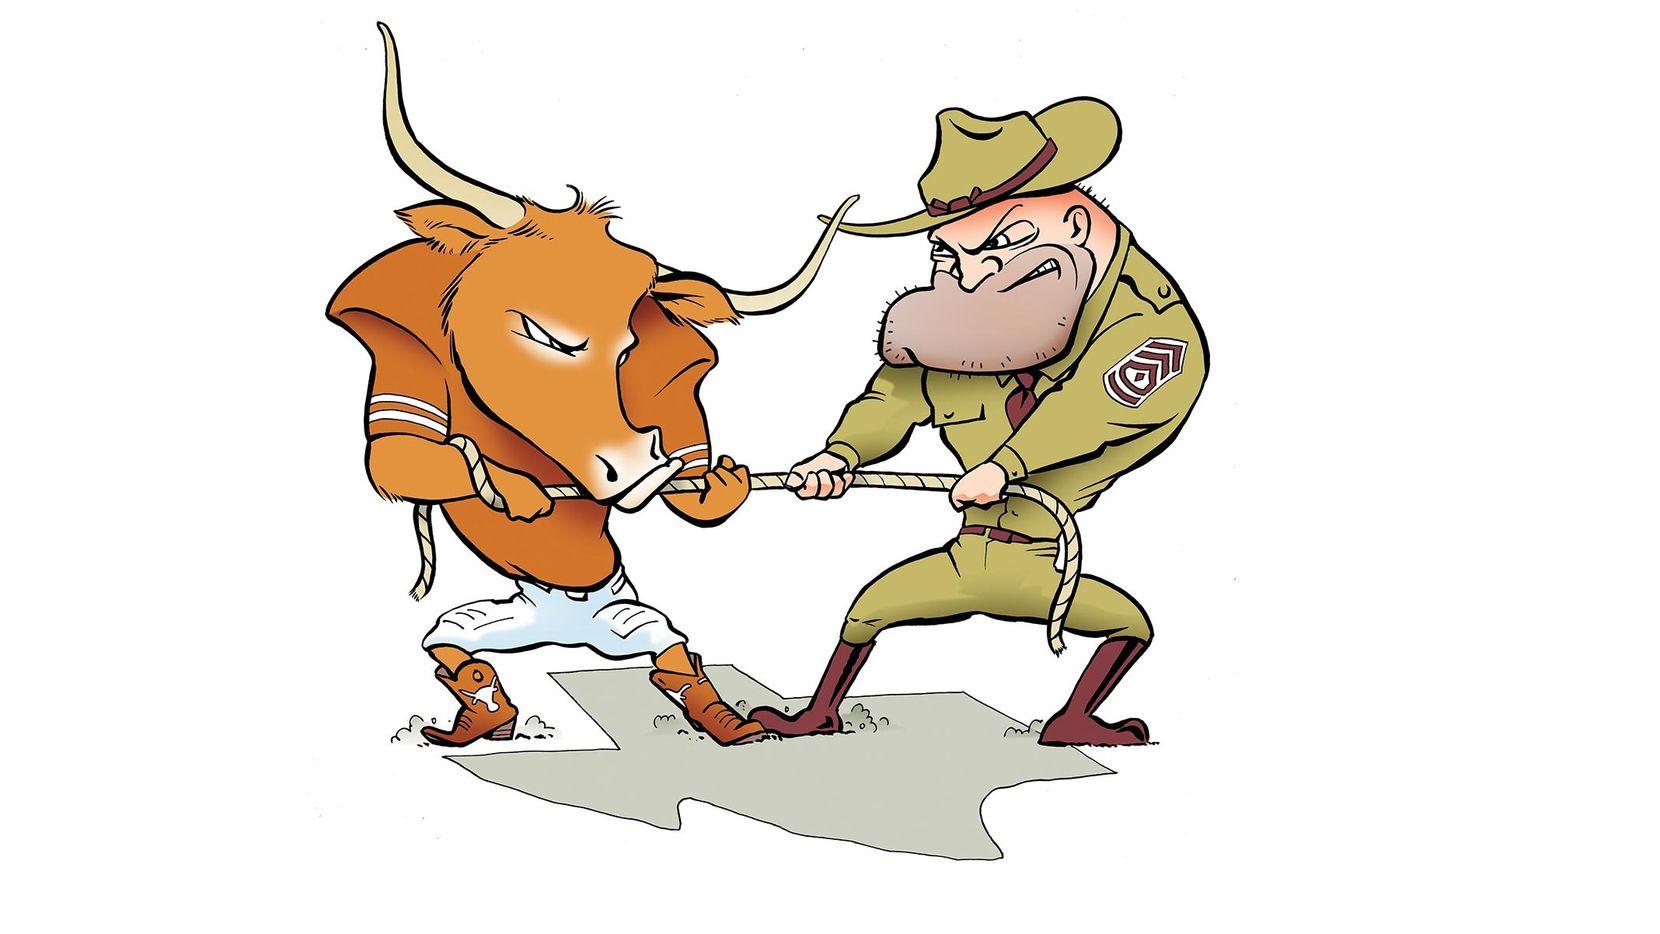 Texas vs. Texas A&M illustration.